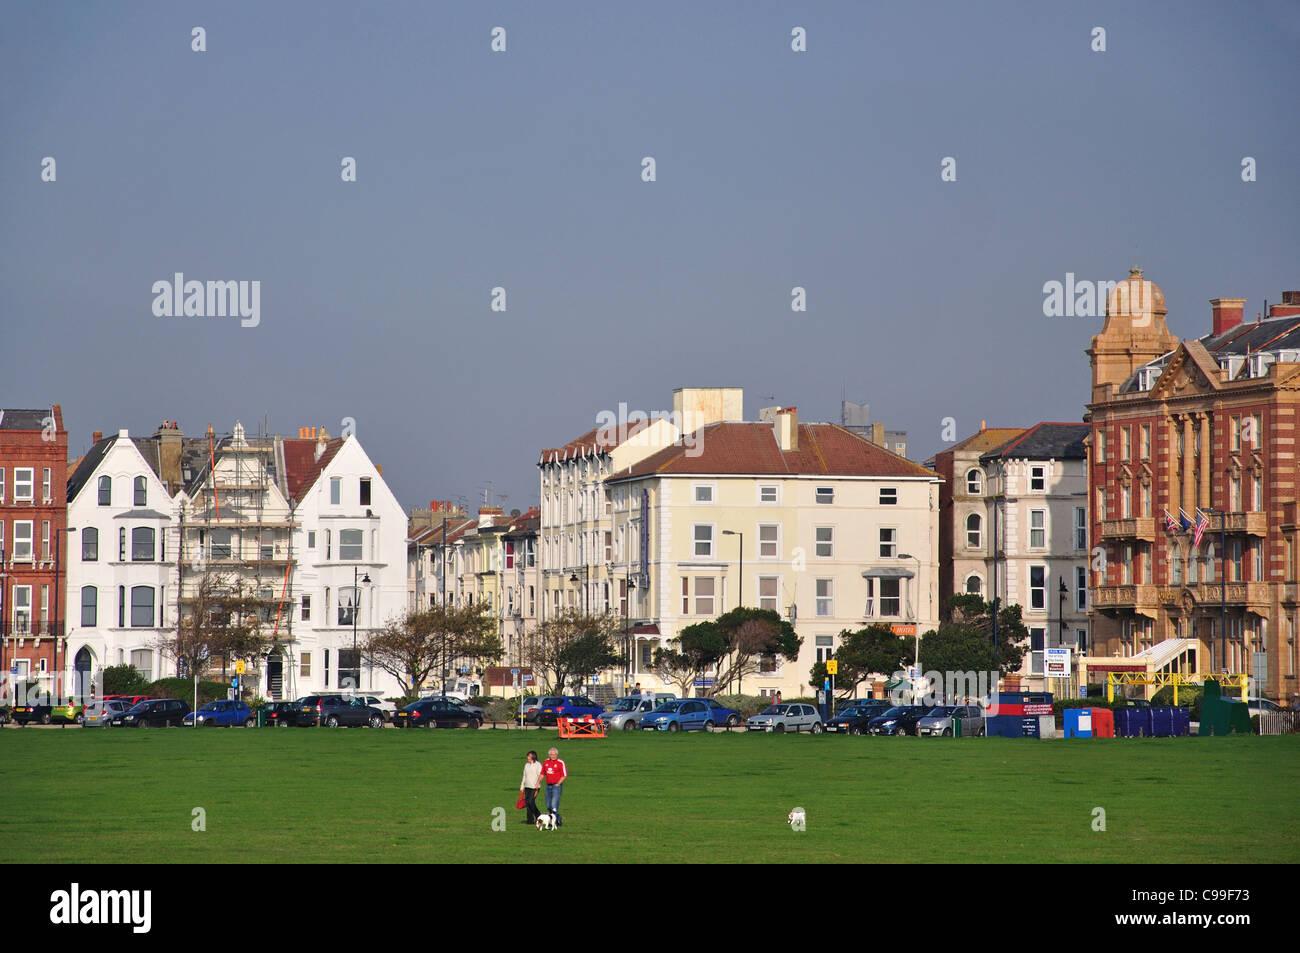 Southsea Common, Southsea, Portsmouth, Hampshire, England, United Kingdom - Stock Image